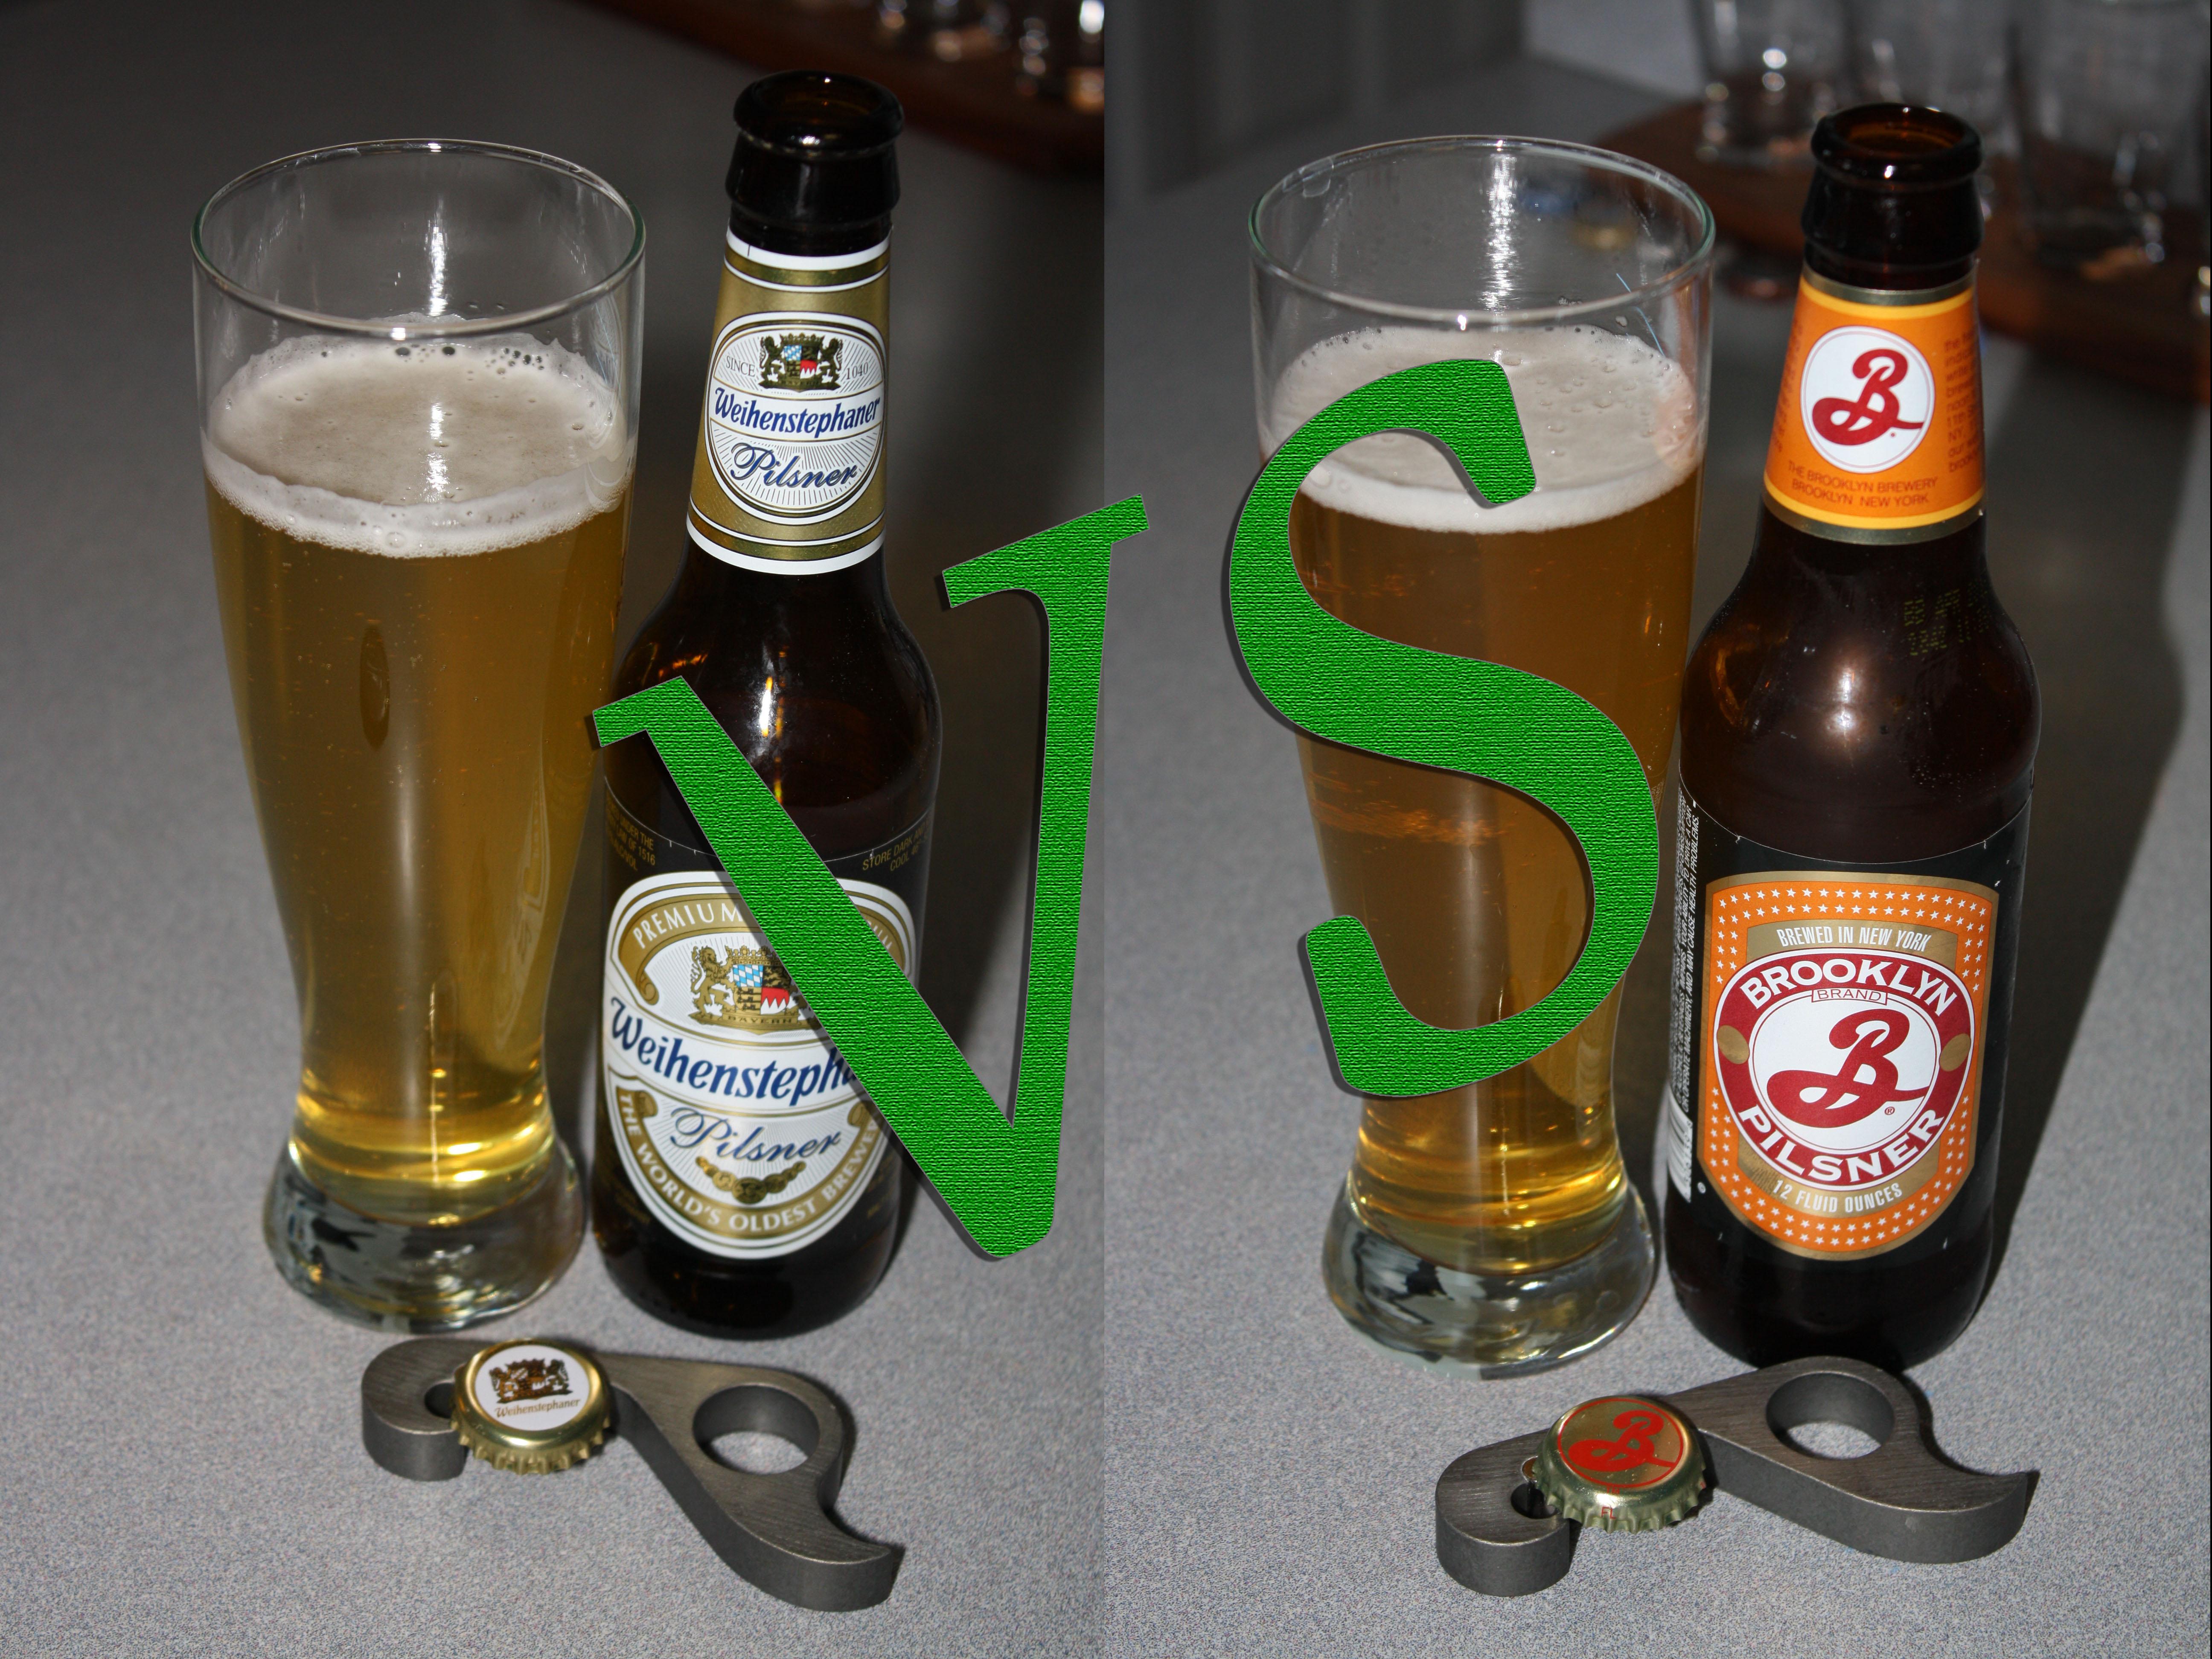 Old Rasputin Stout Beer Brewery Coaster ~ NORTH COAST Brewing Scrimshaw Pilsner